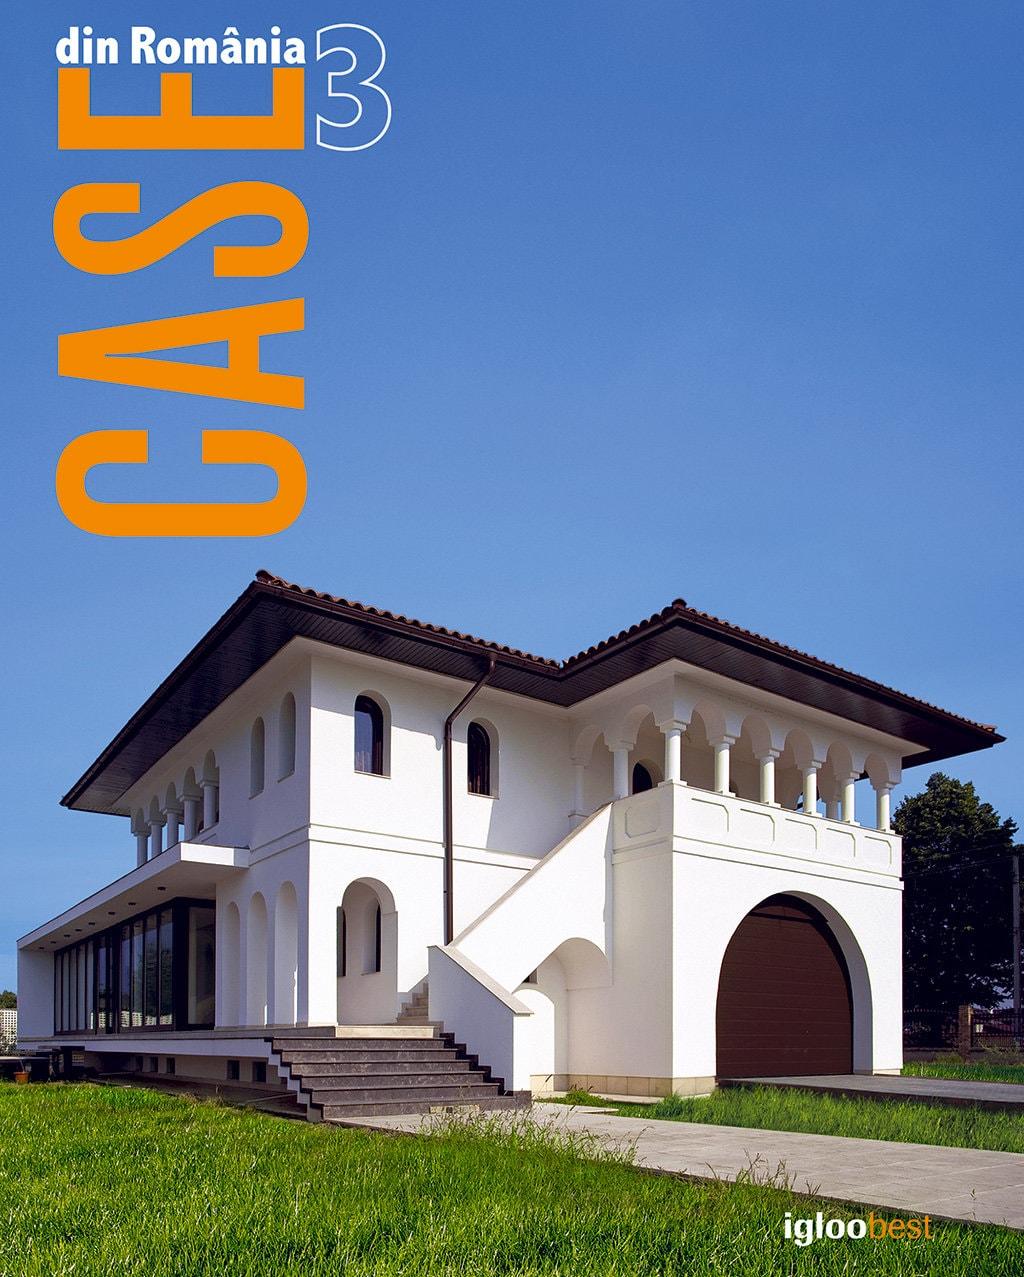 igloomedia prezintă: Case din România volumul 3